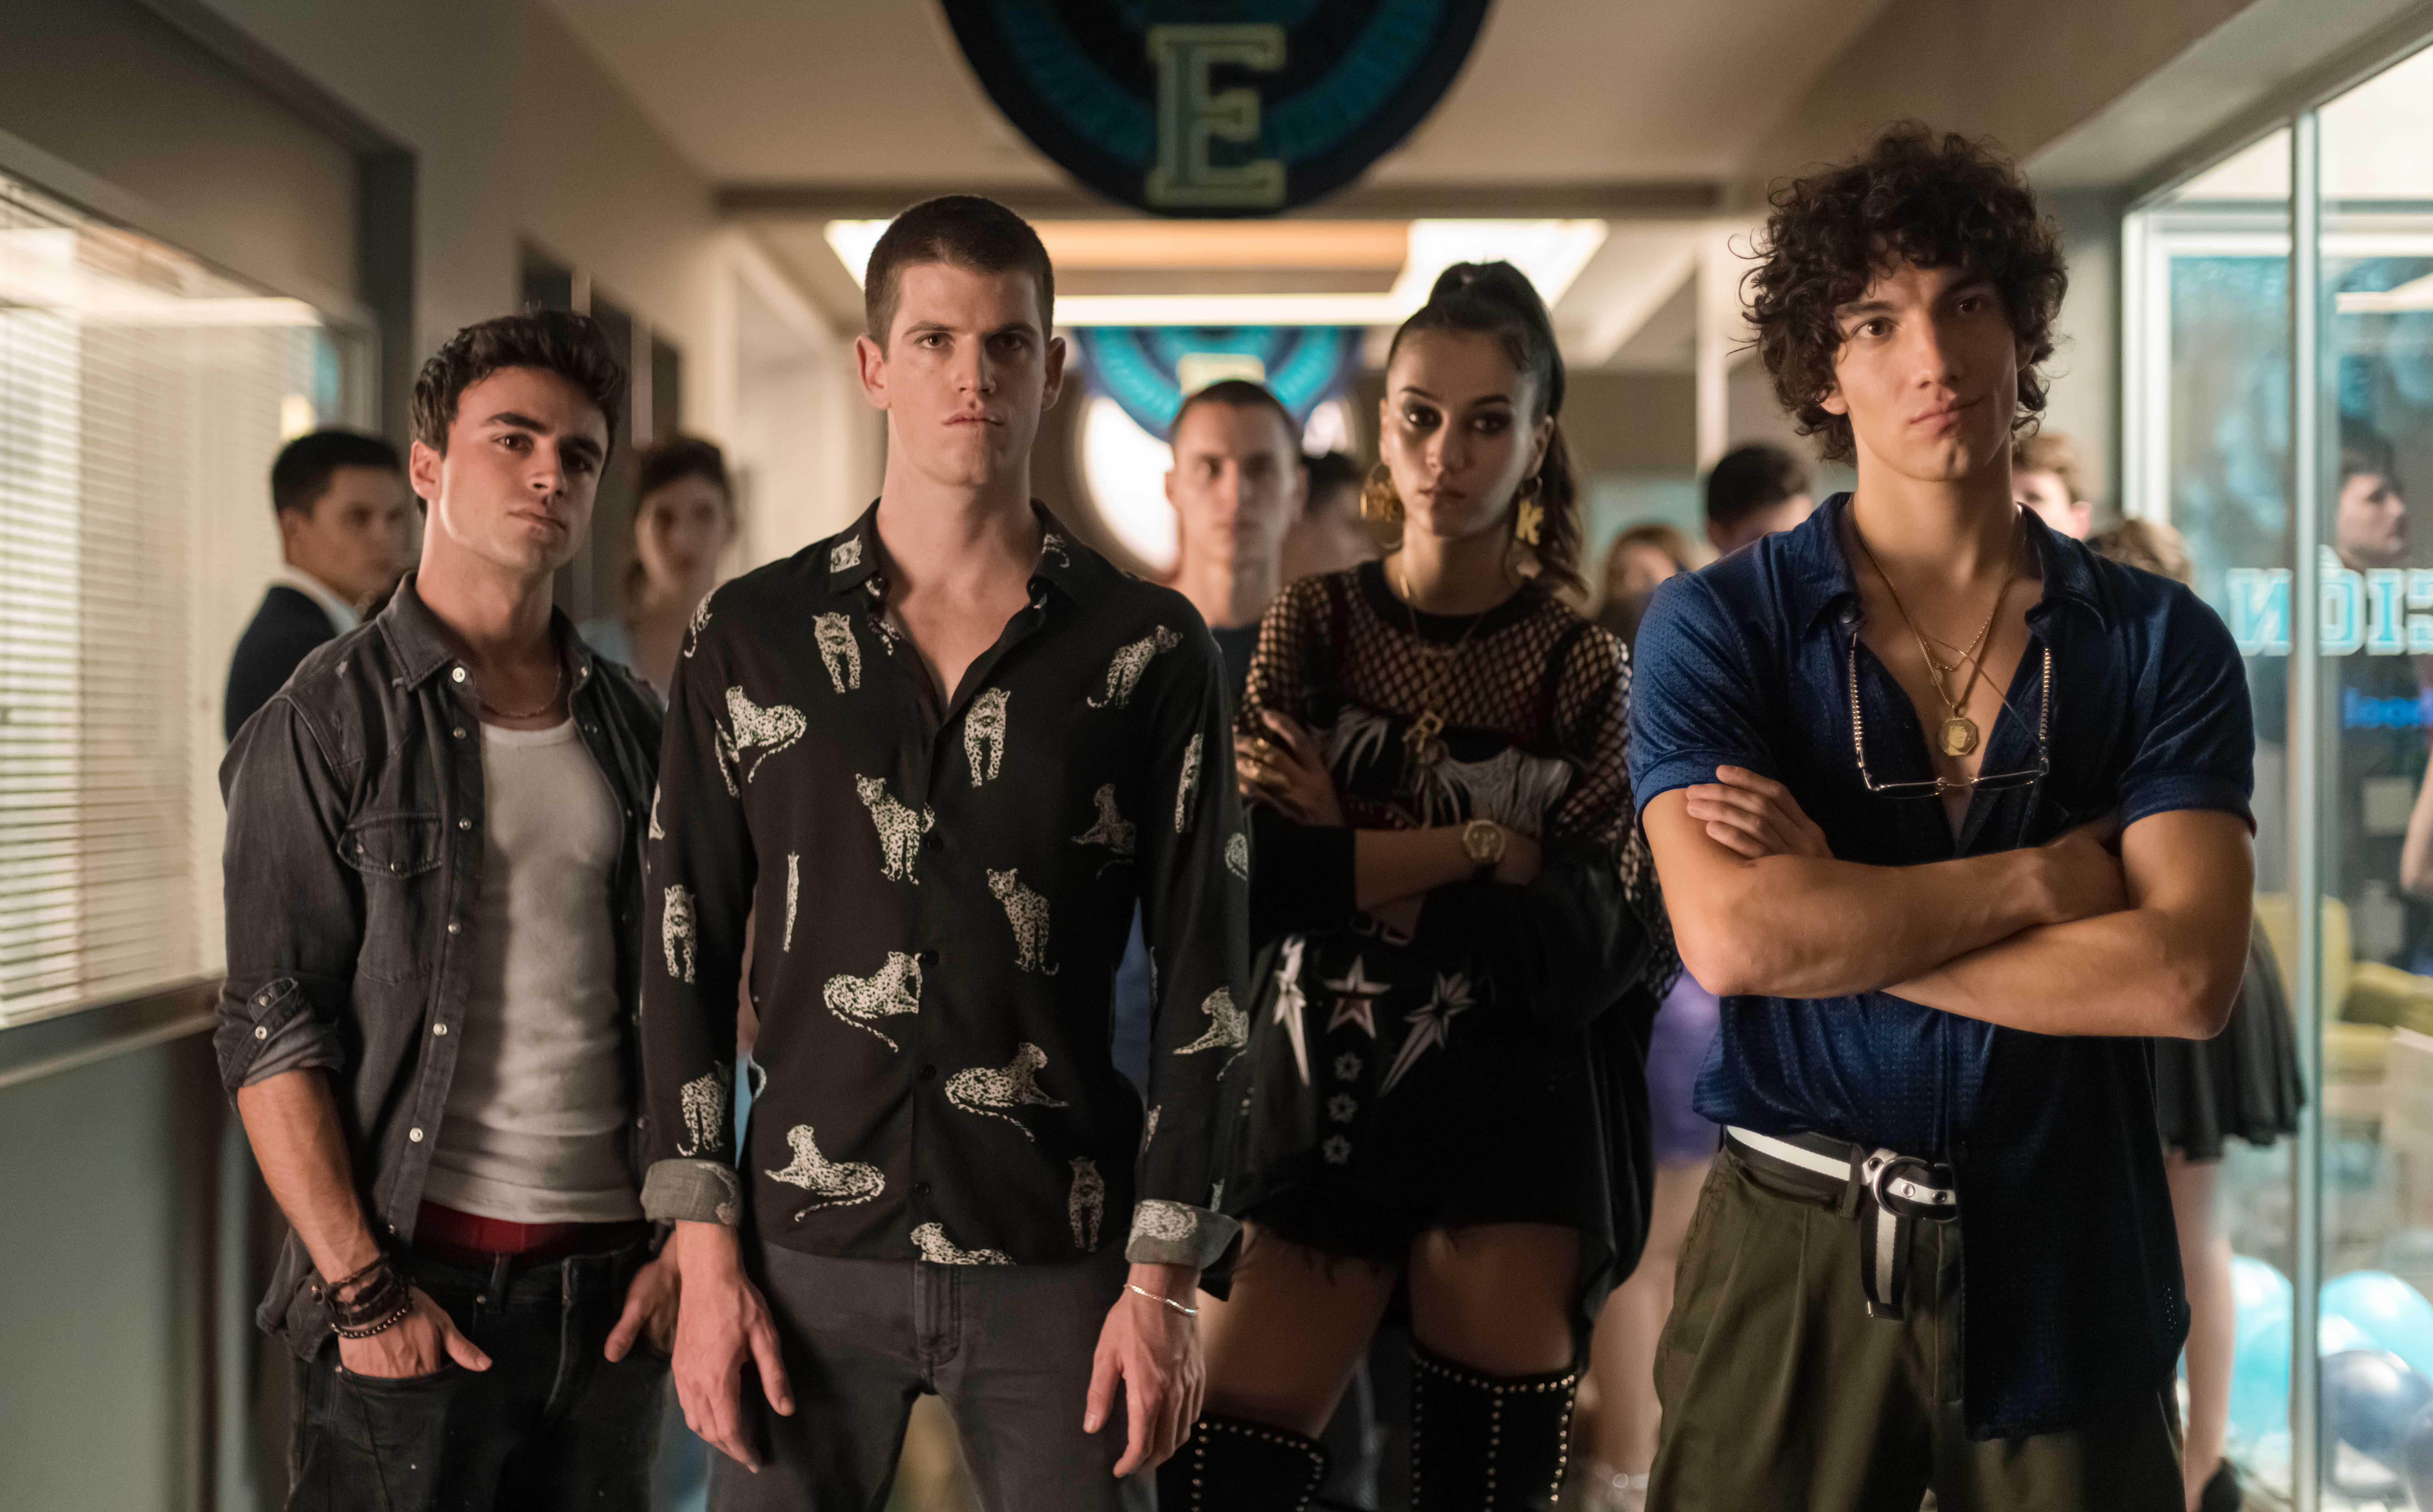 TRAILER: Season 3 of 'Elite' Promises More Drama & Heartbreak at Las Encinas